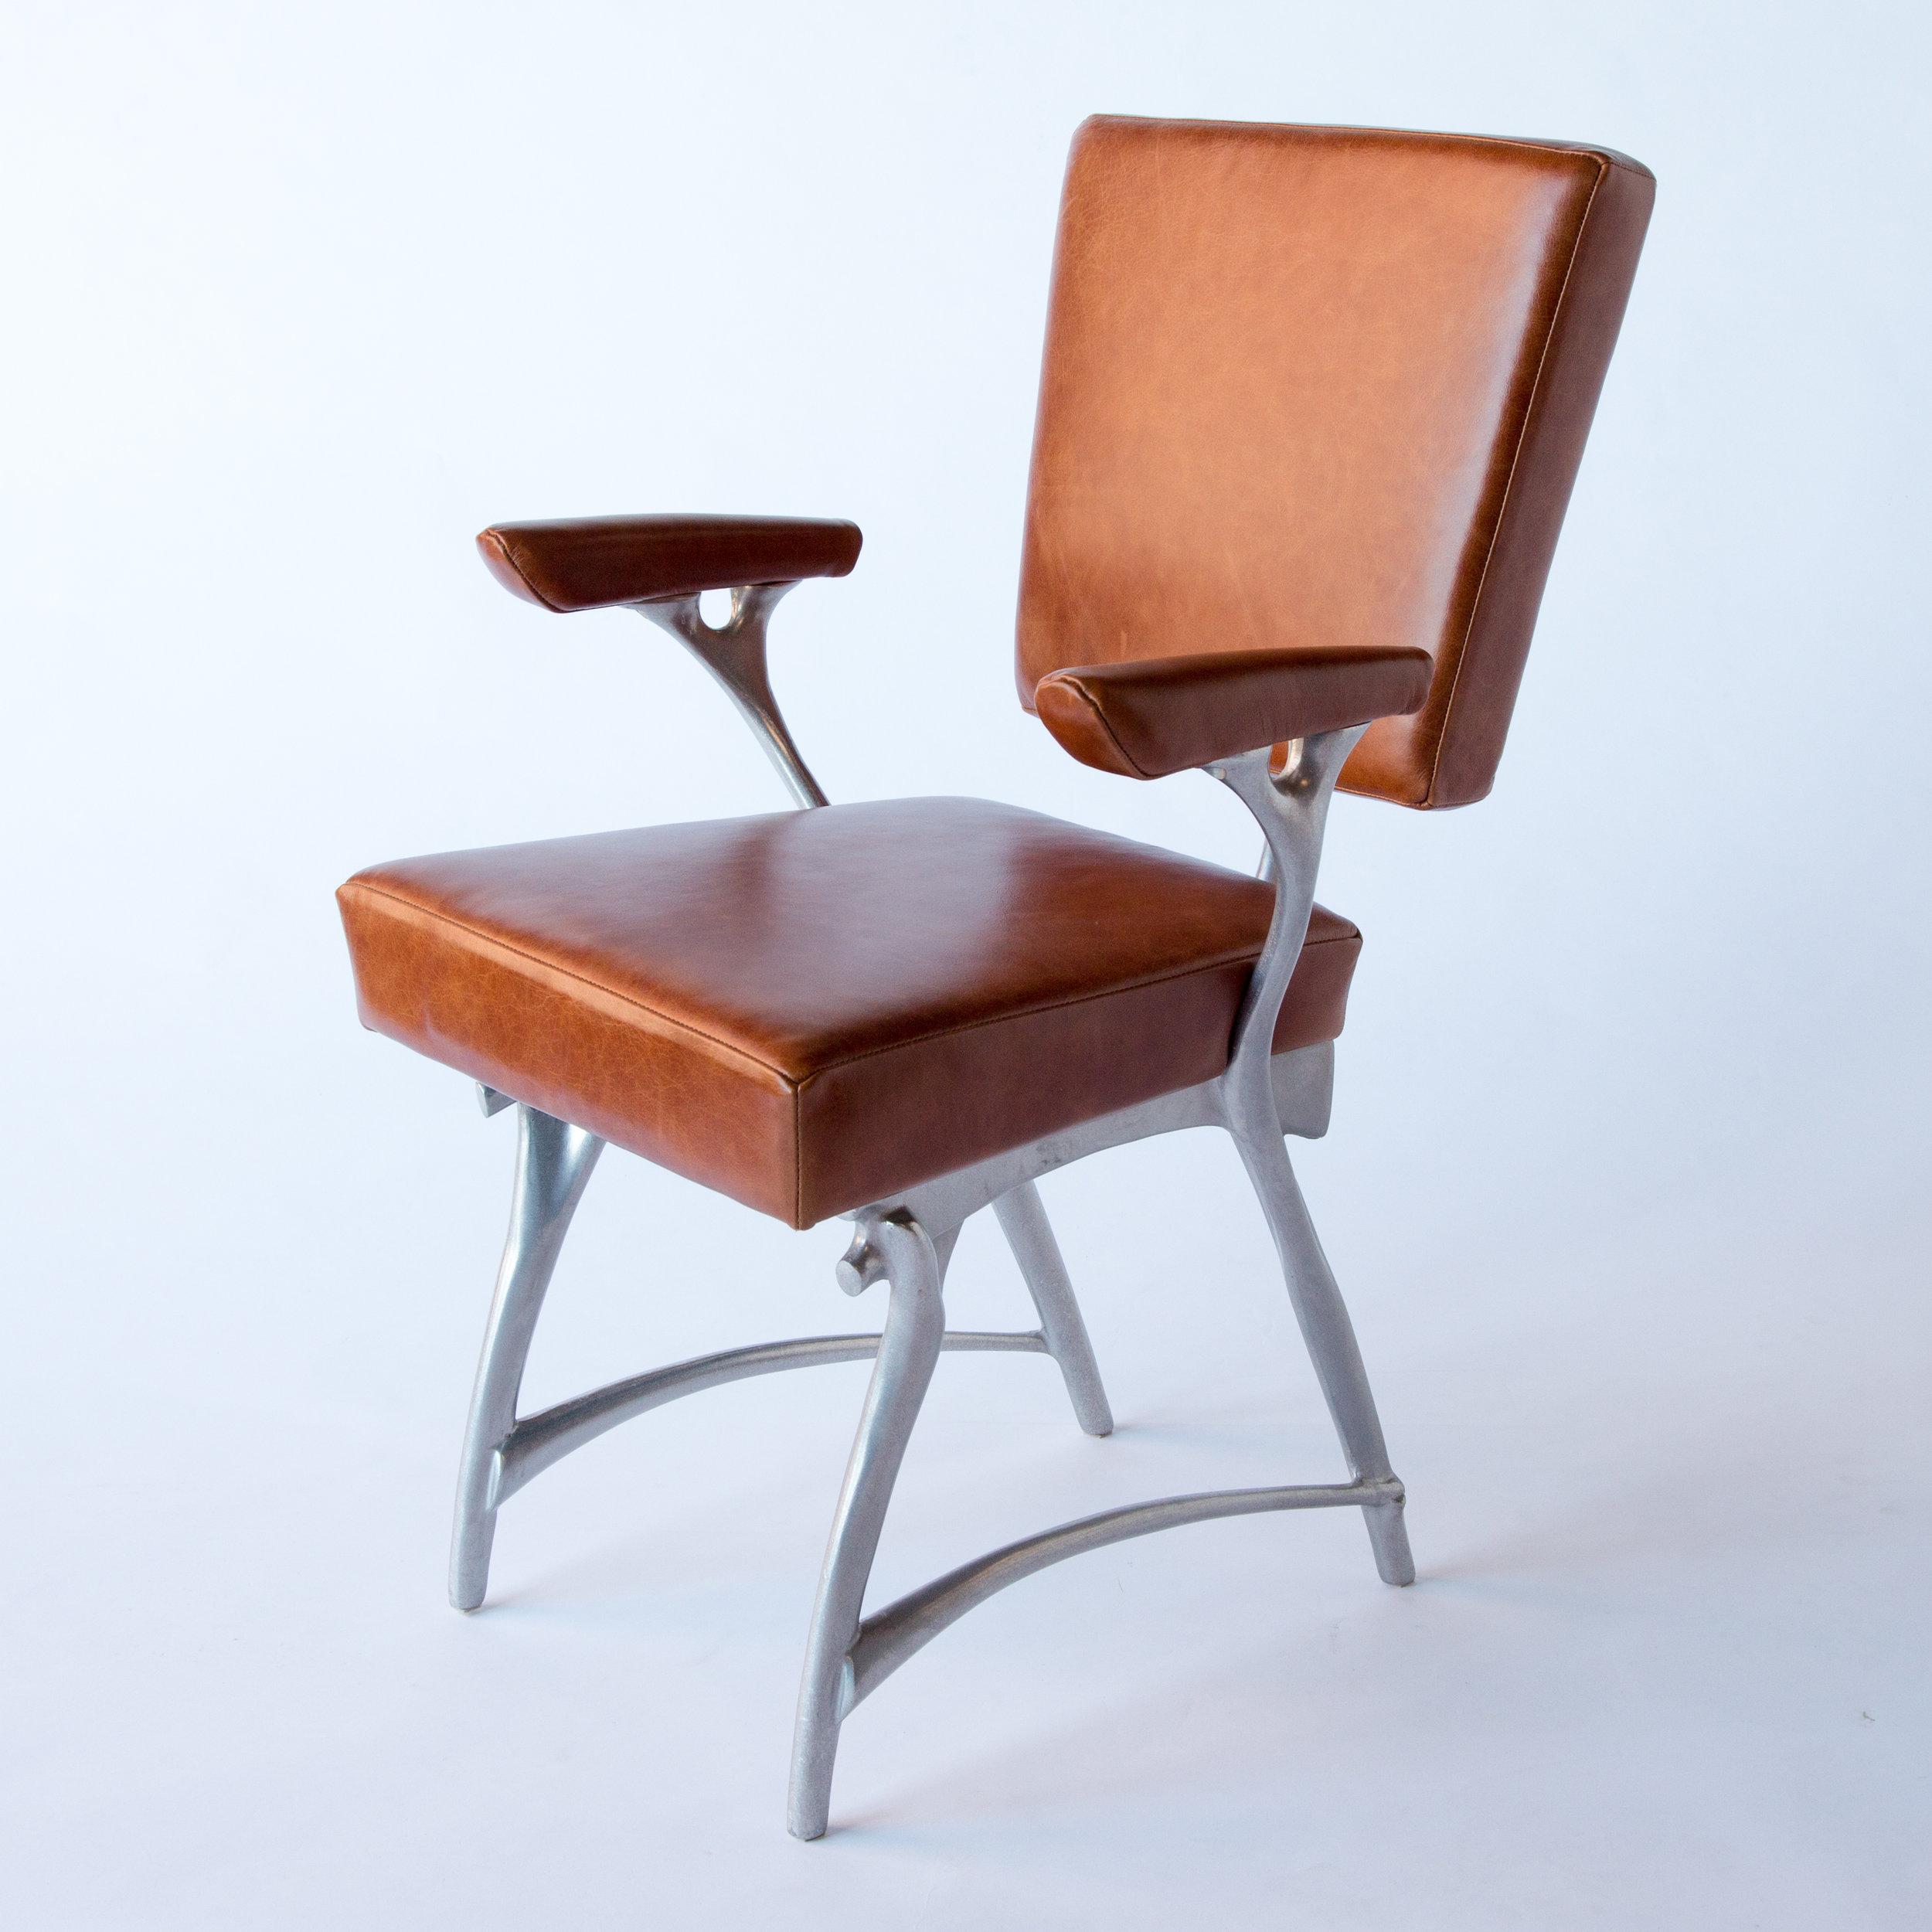 Twig Chair Light-1.jpg